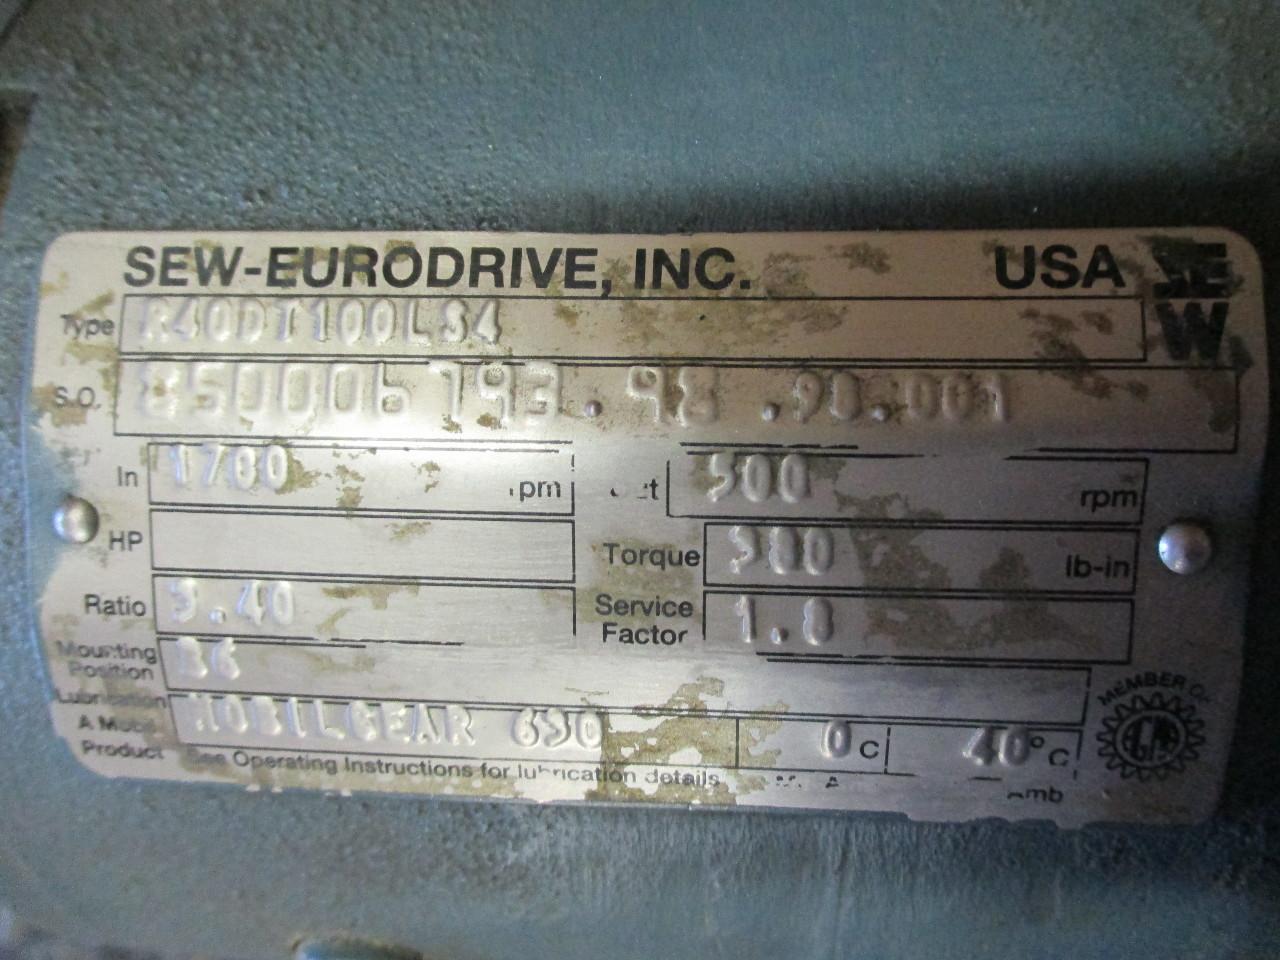 stearns motor brake wiring diagram fisher snow plow sew eurodrive 5 hp panasonic